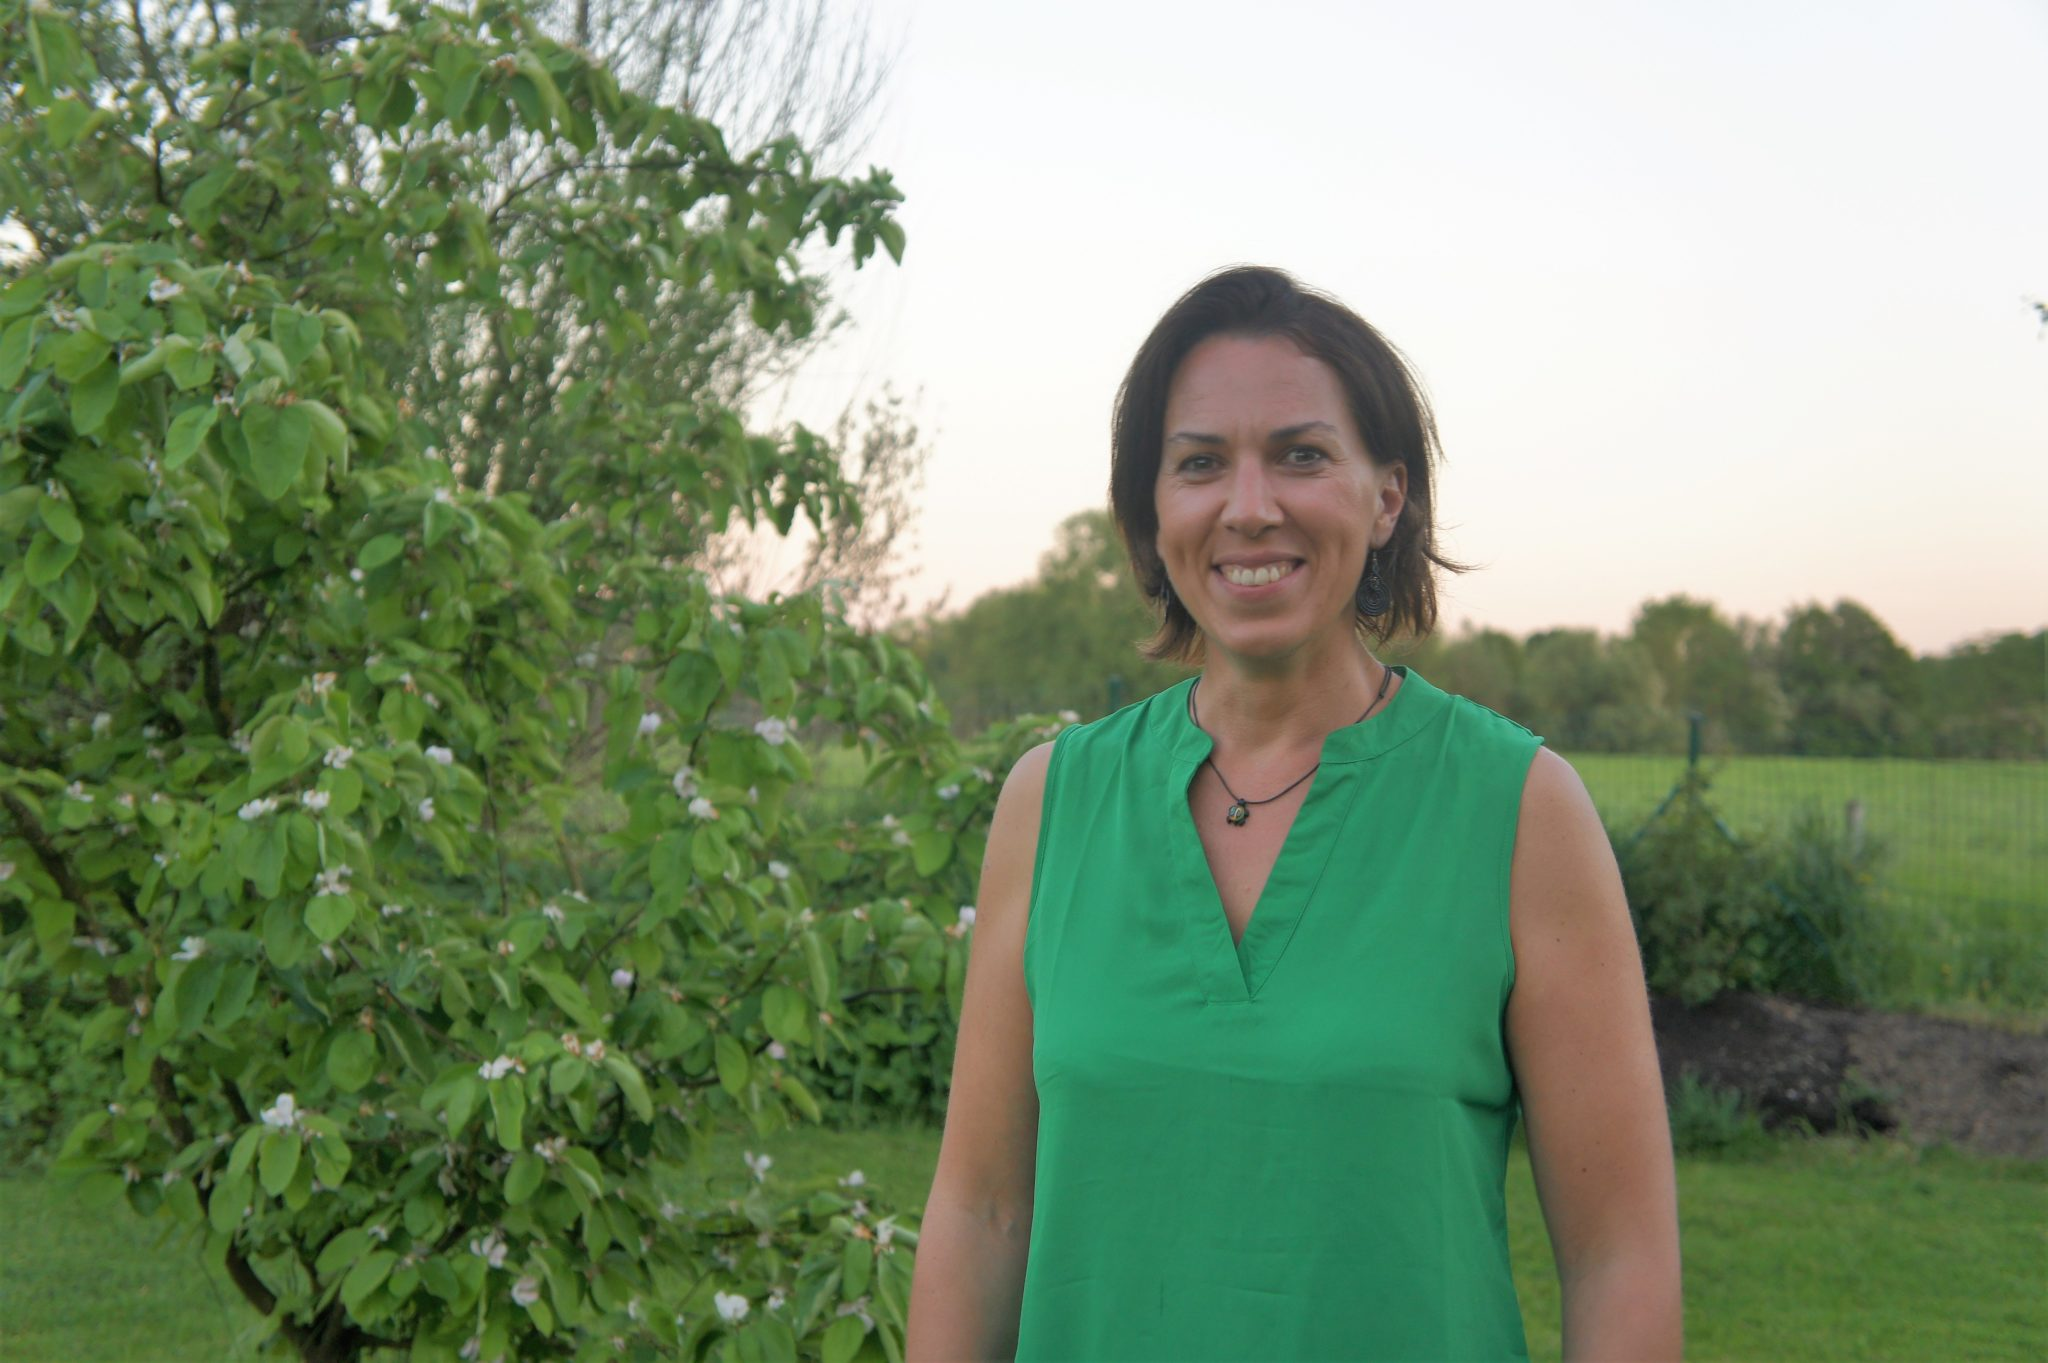 Céline Detournay